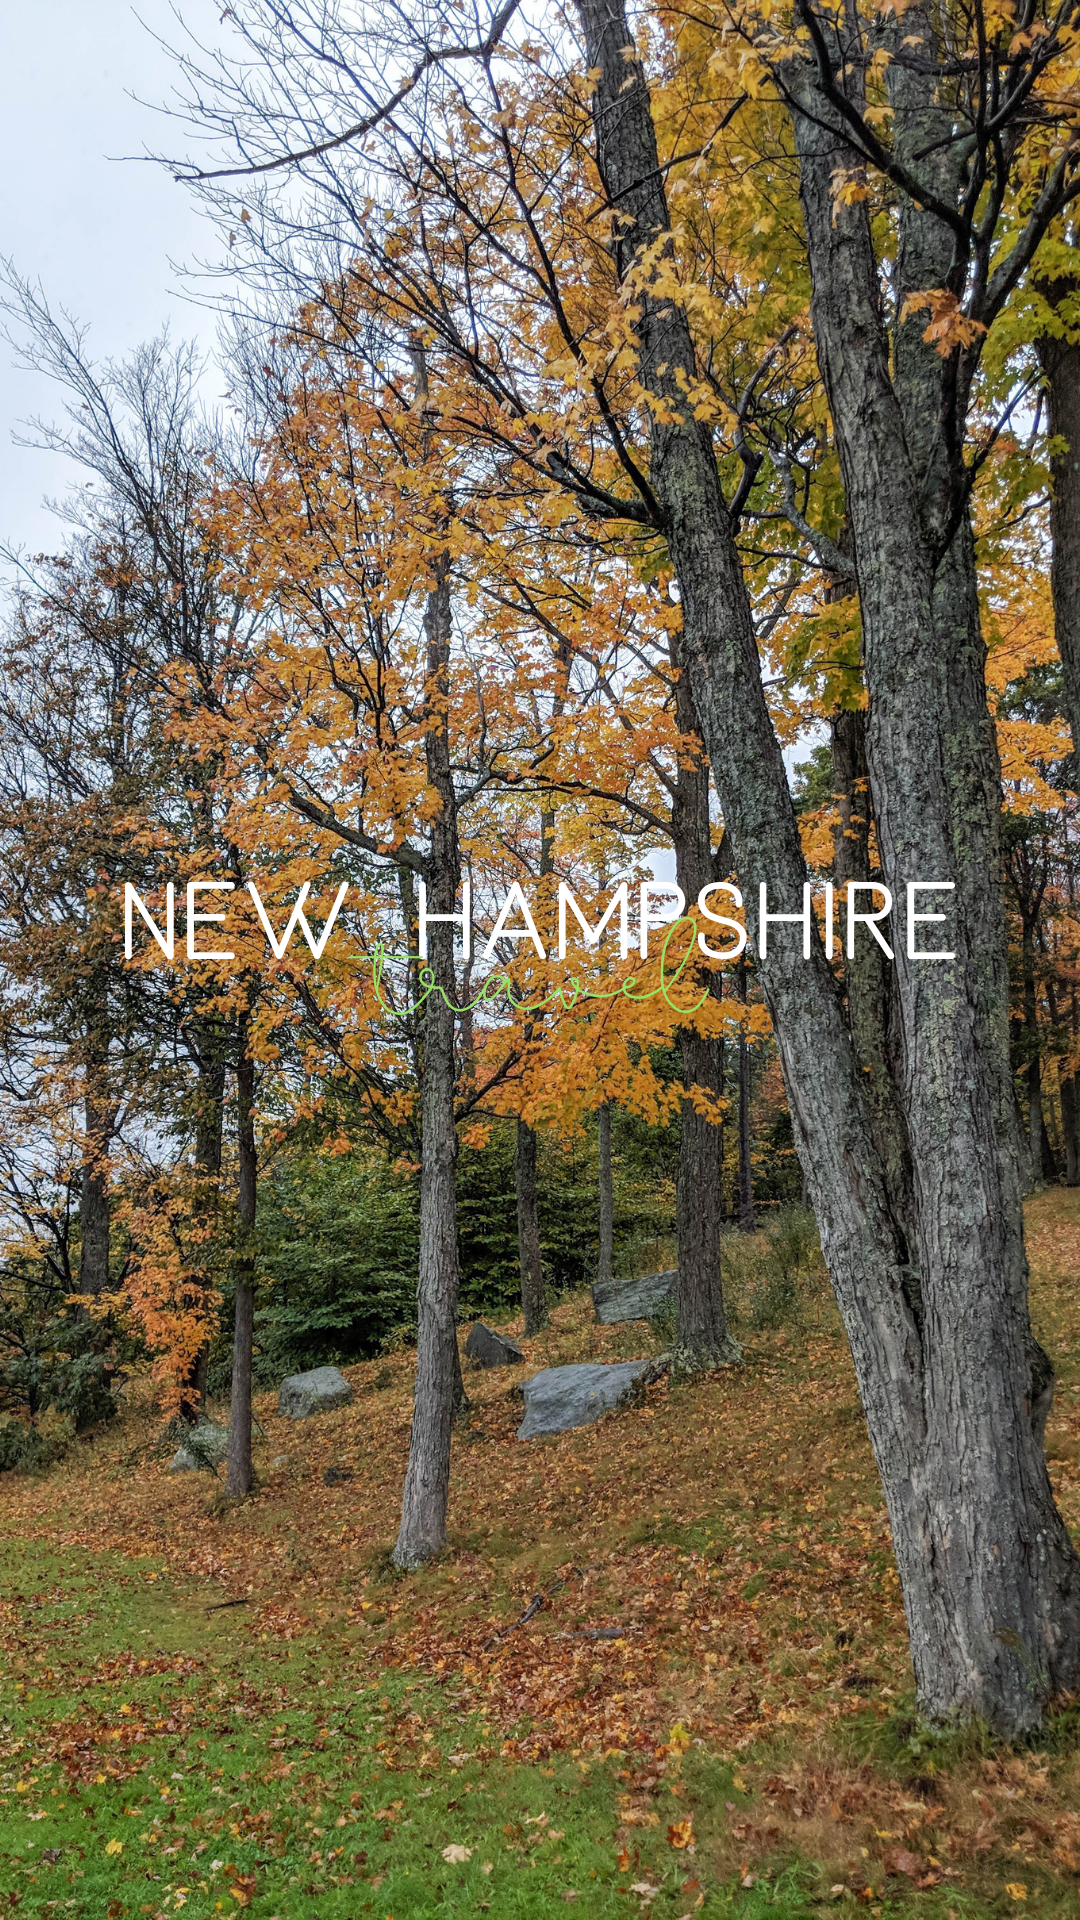 bri rinehart; new hampshire travel